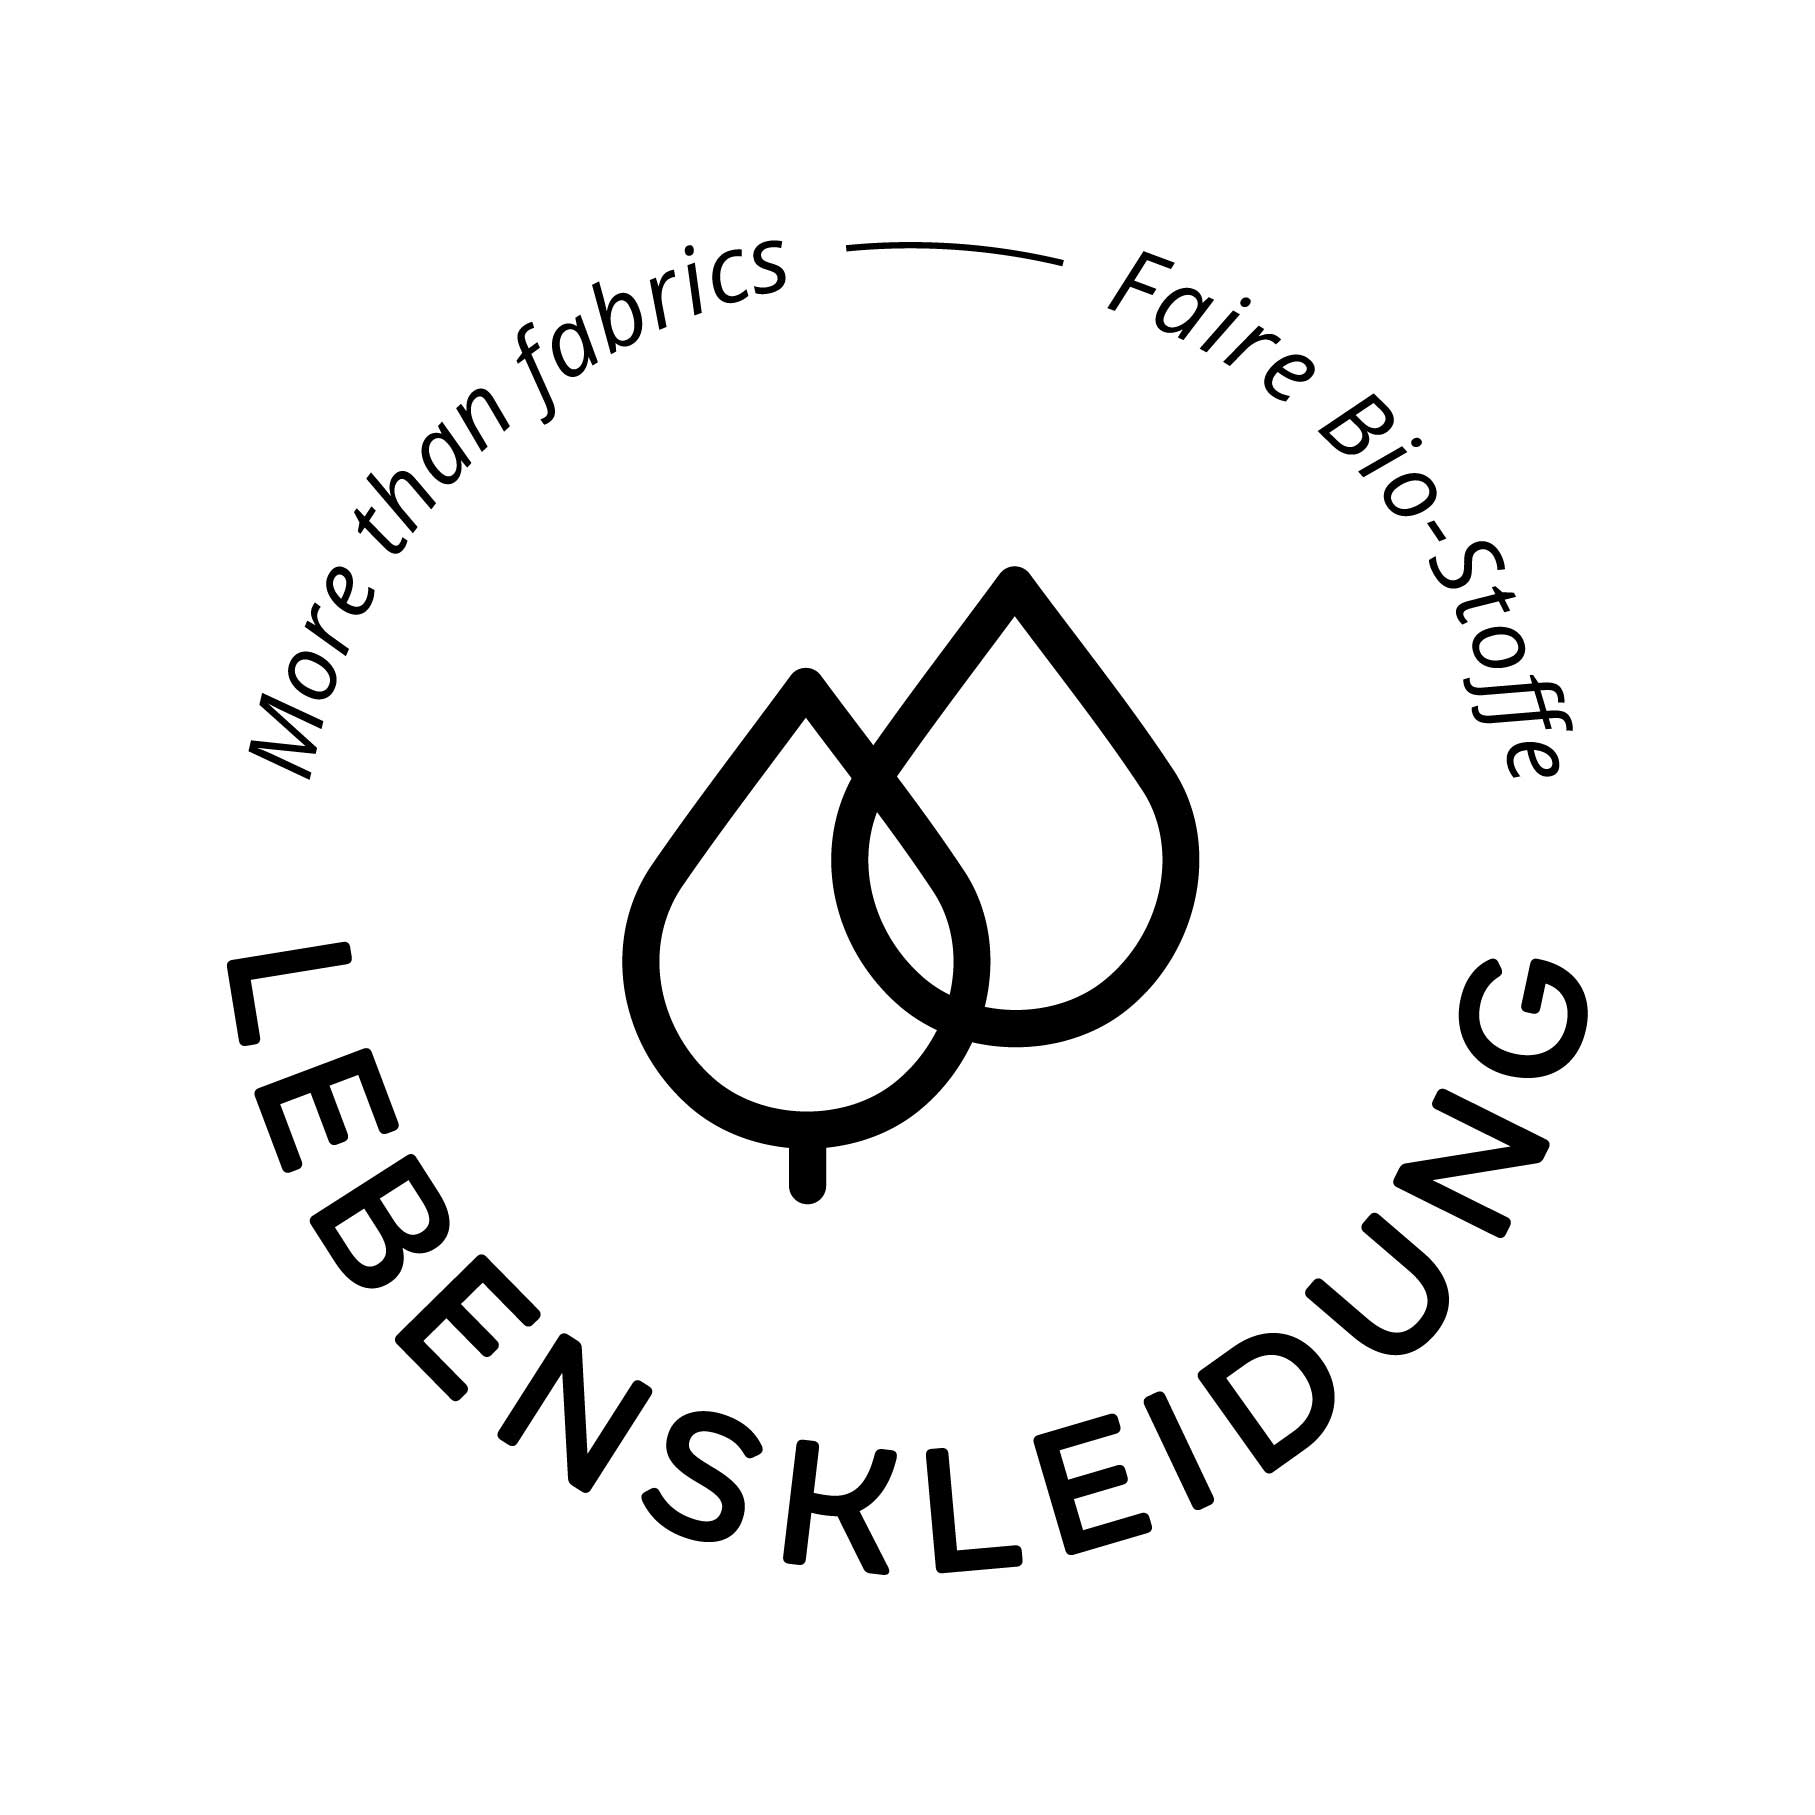 Tessuti organici Tessuto di RIB 2x1 (Polsino) - Borgogna NUOVE